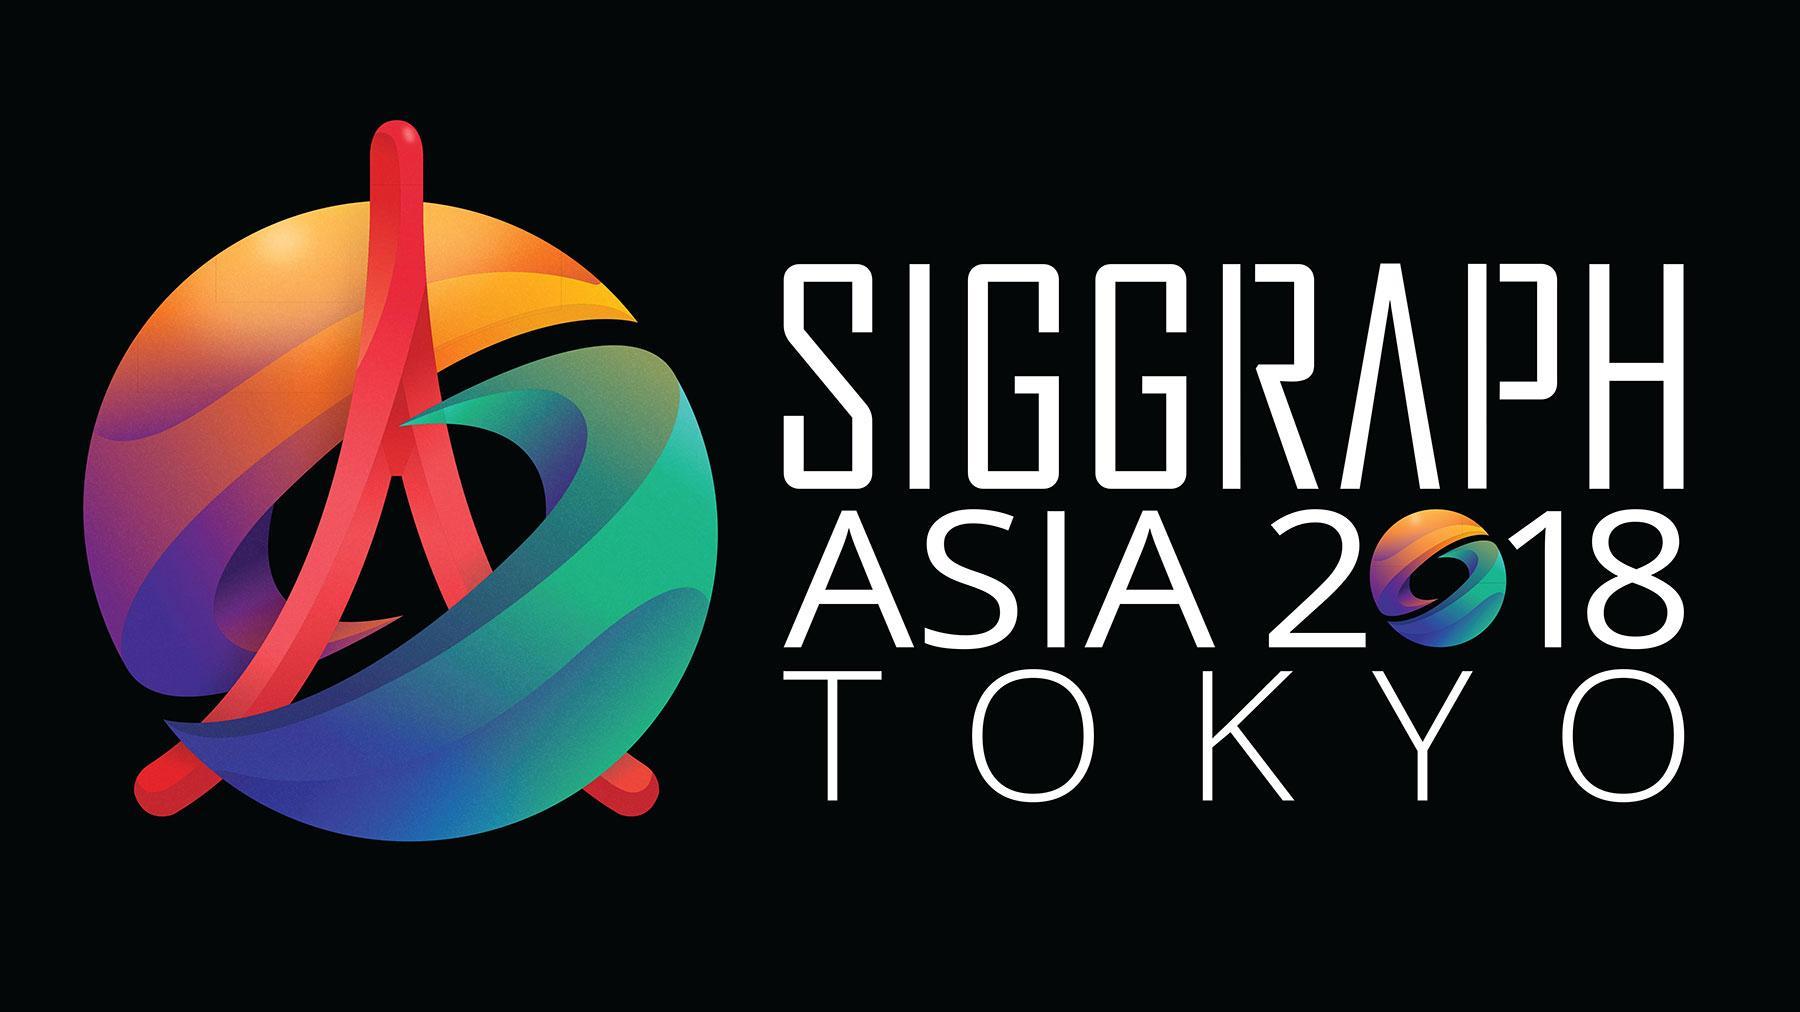 Tokyo Siggraph